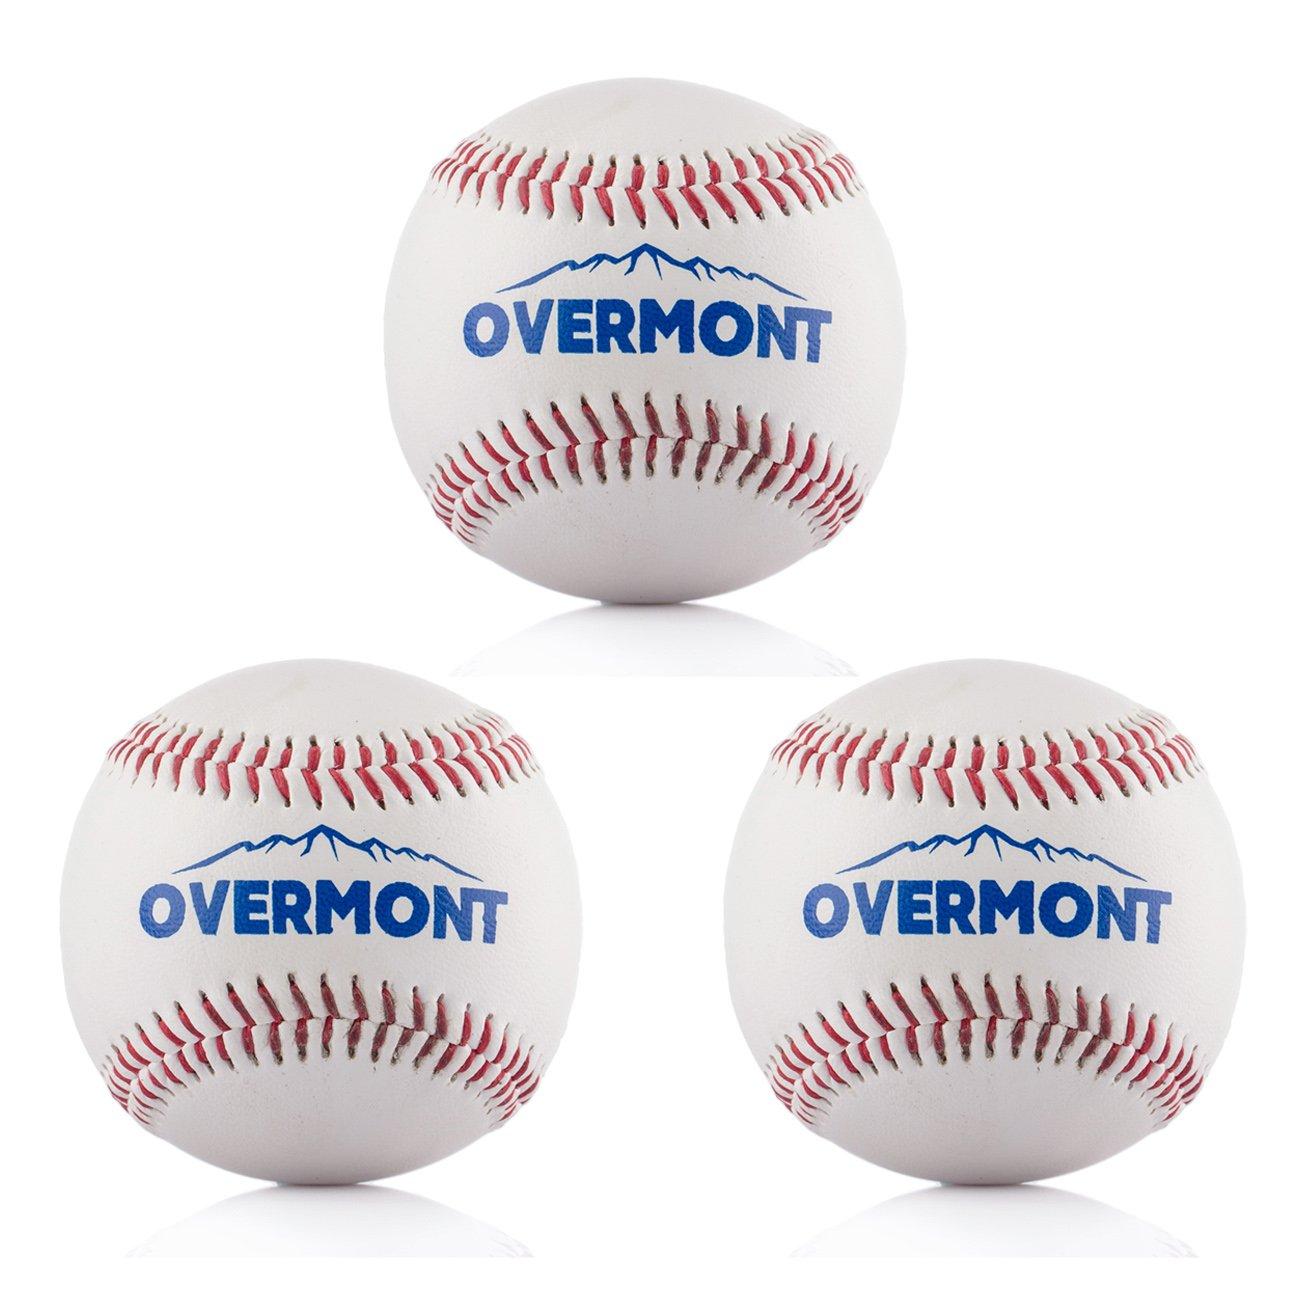 Overmont pelota de beisbol sofbal softball de Cuero Sintetico, color blanco OM-Baseball